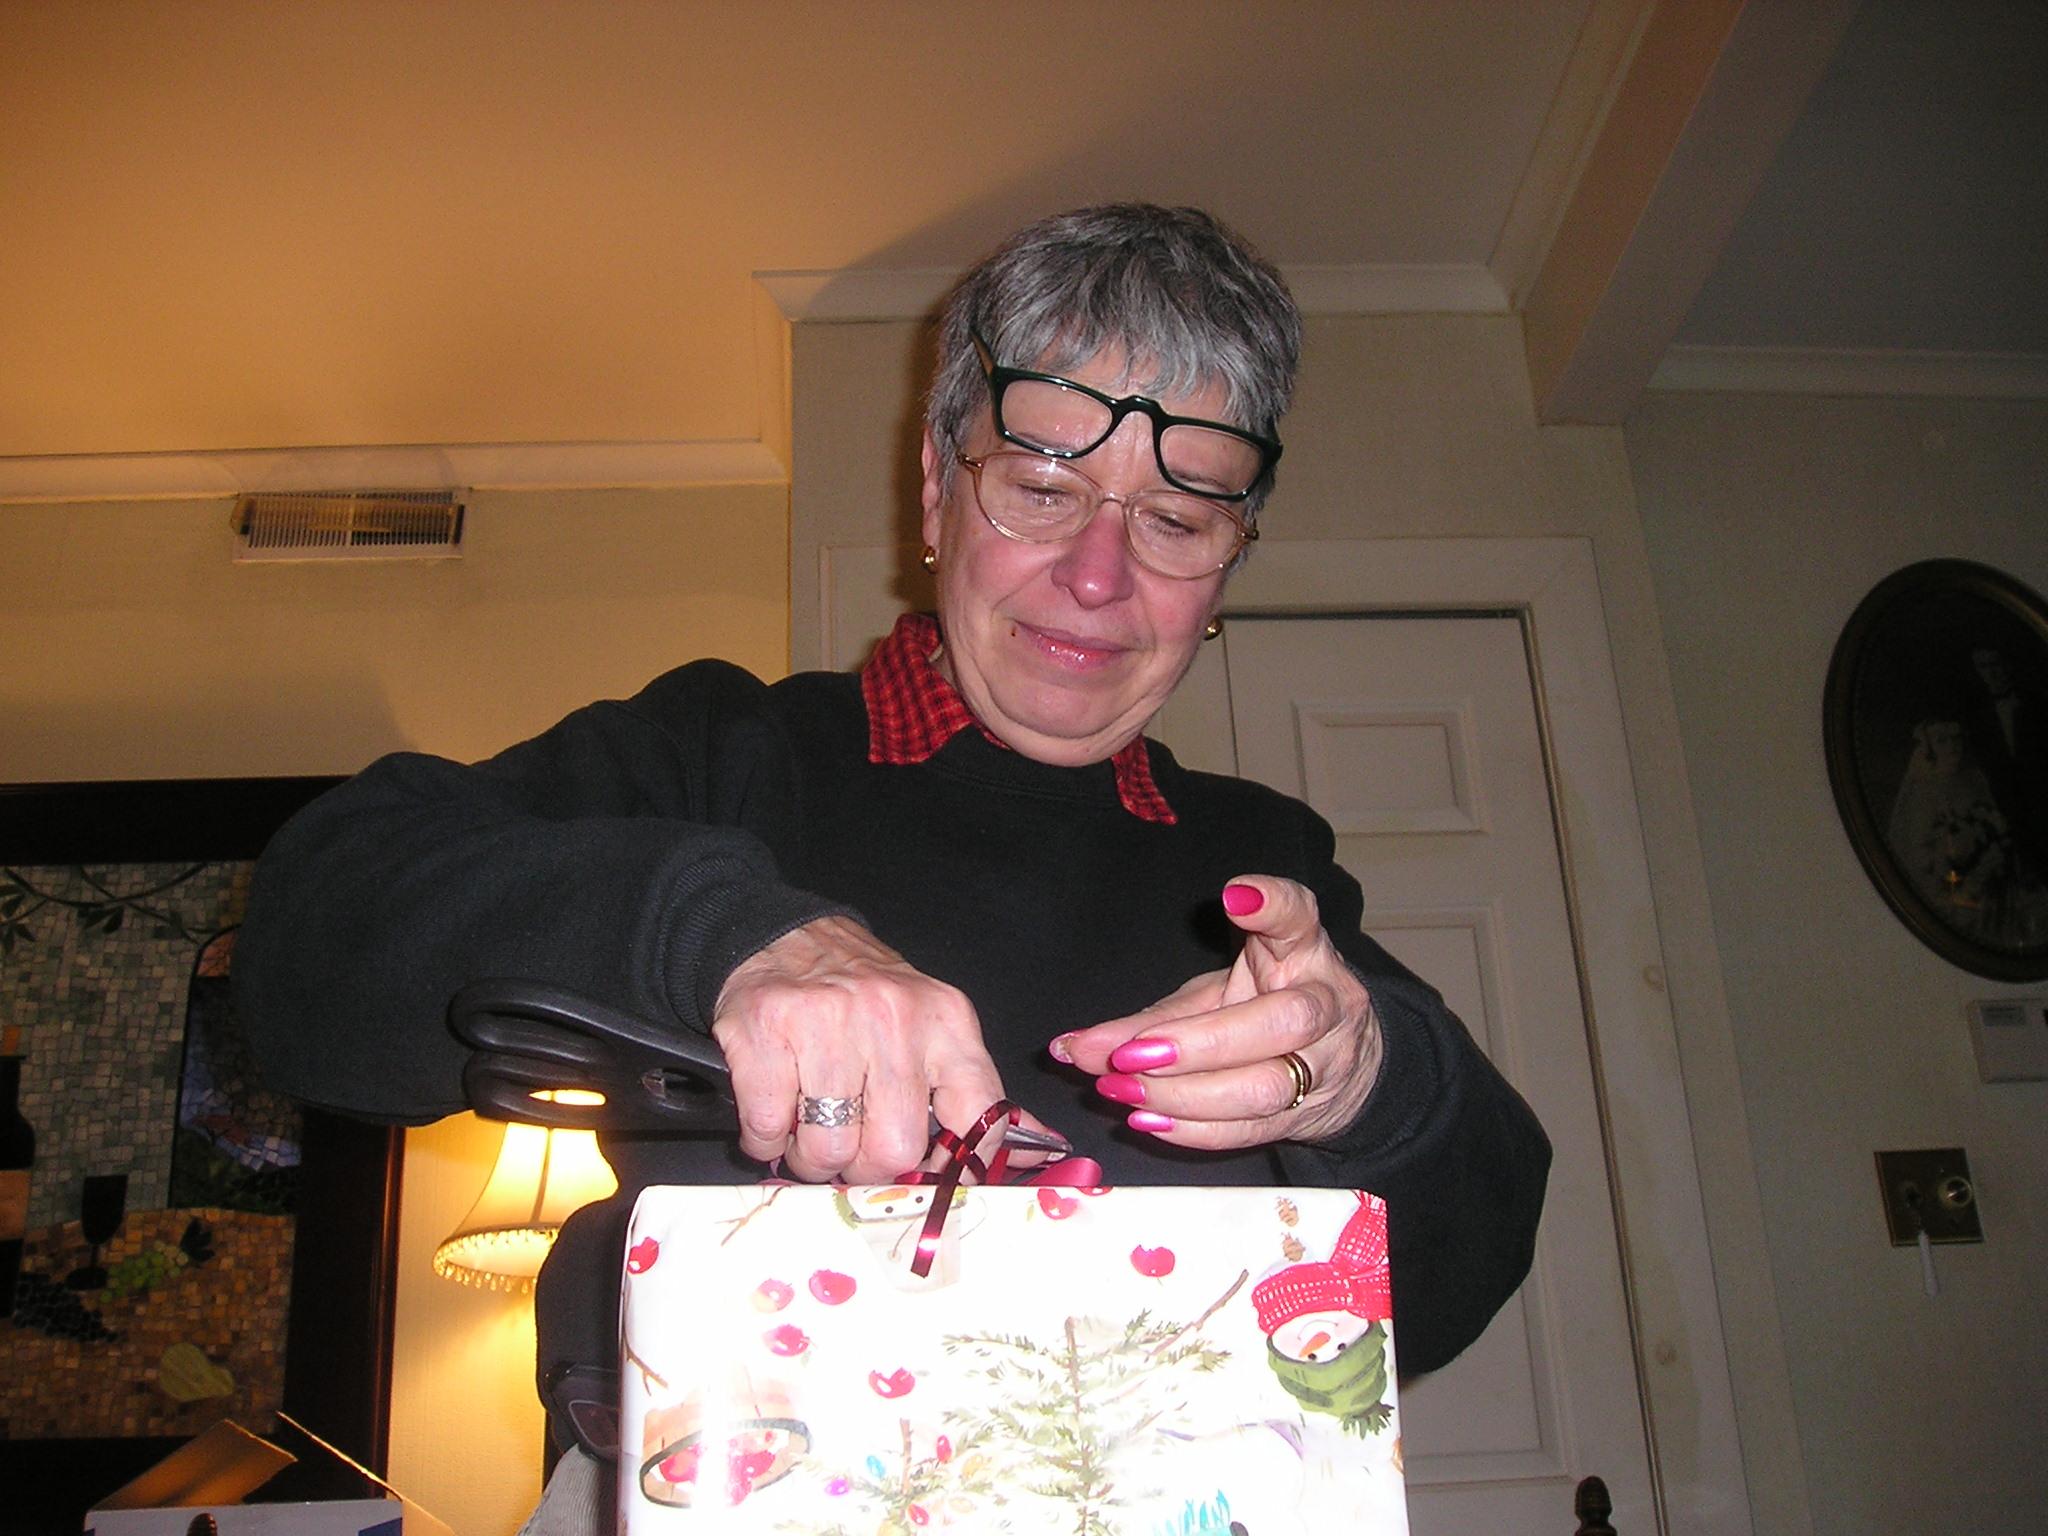 Master Wrapper McGoo